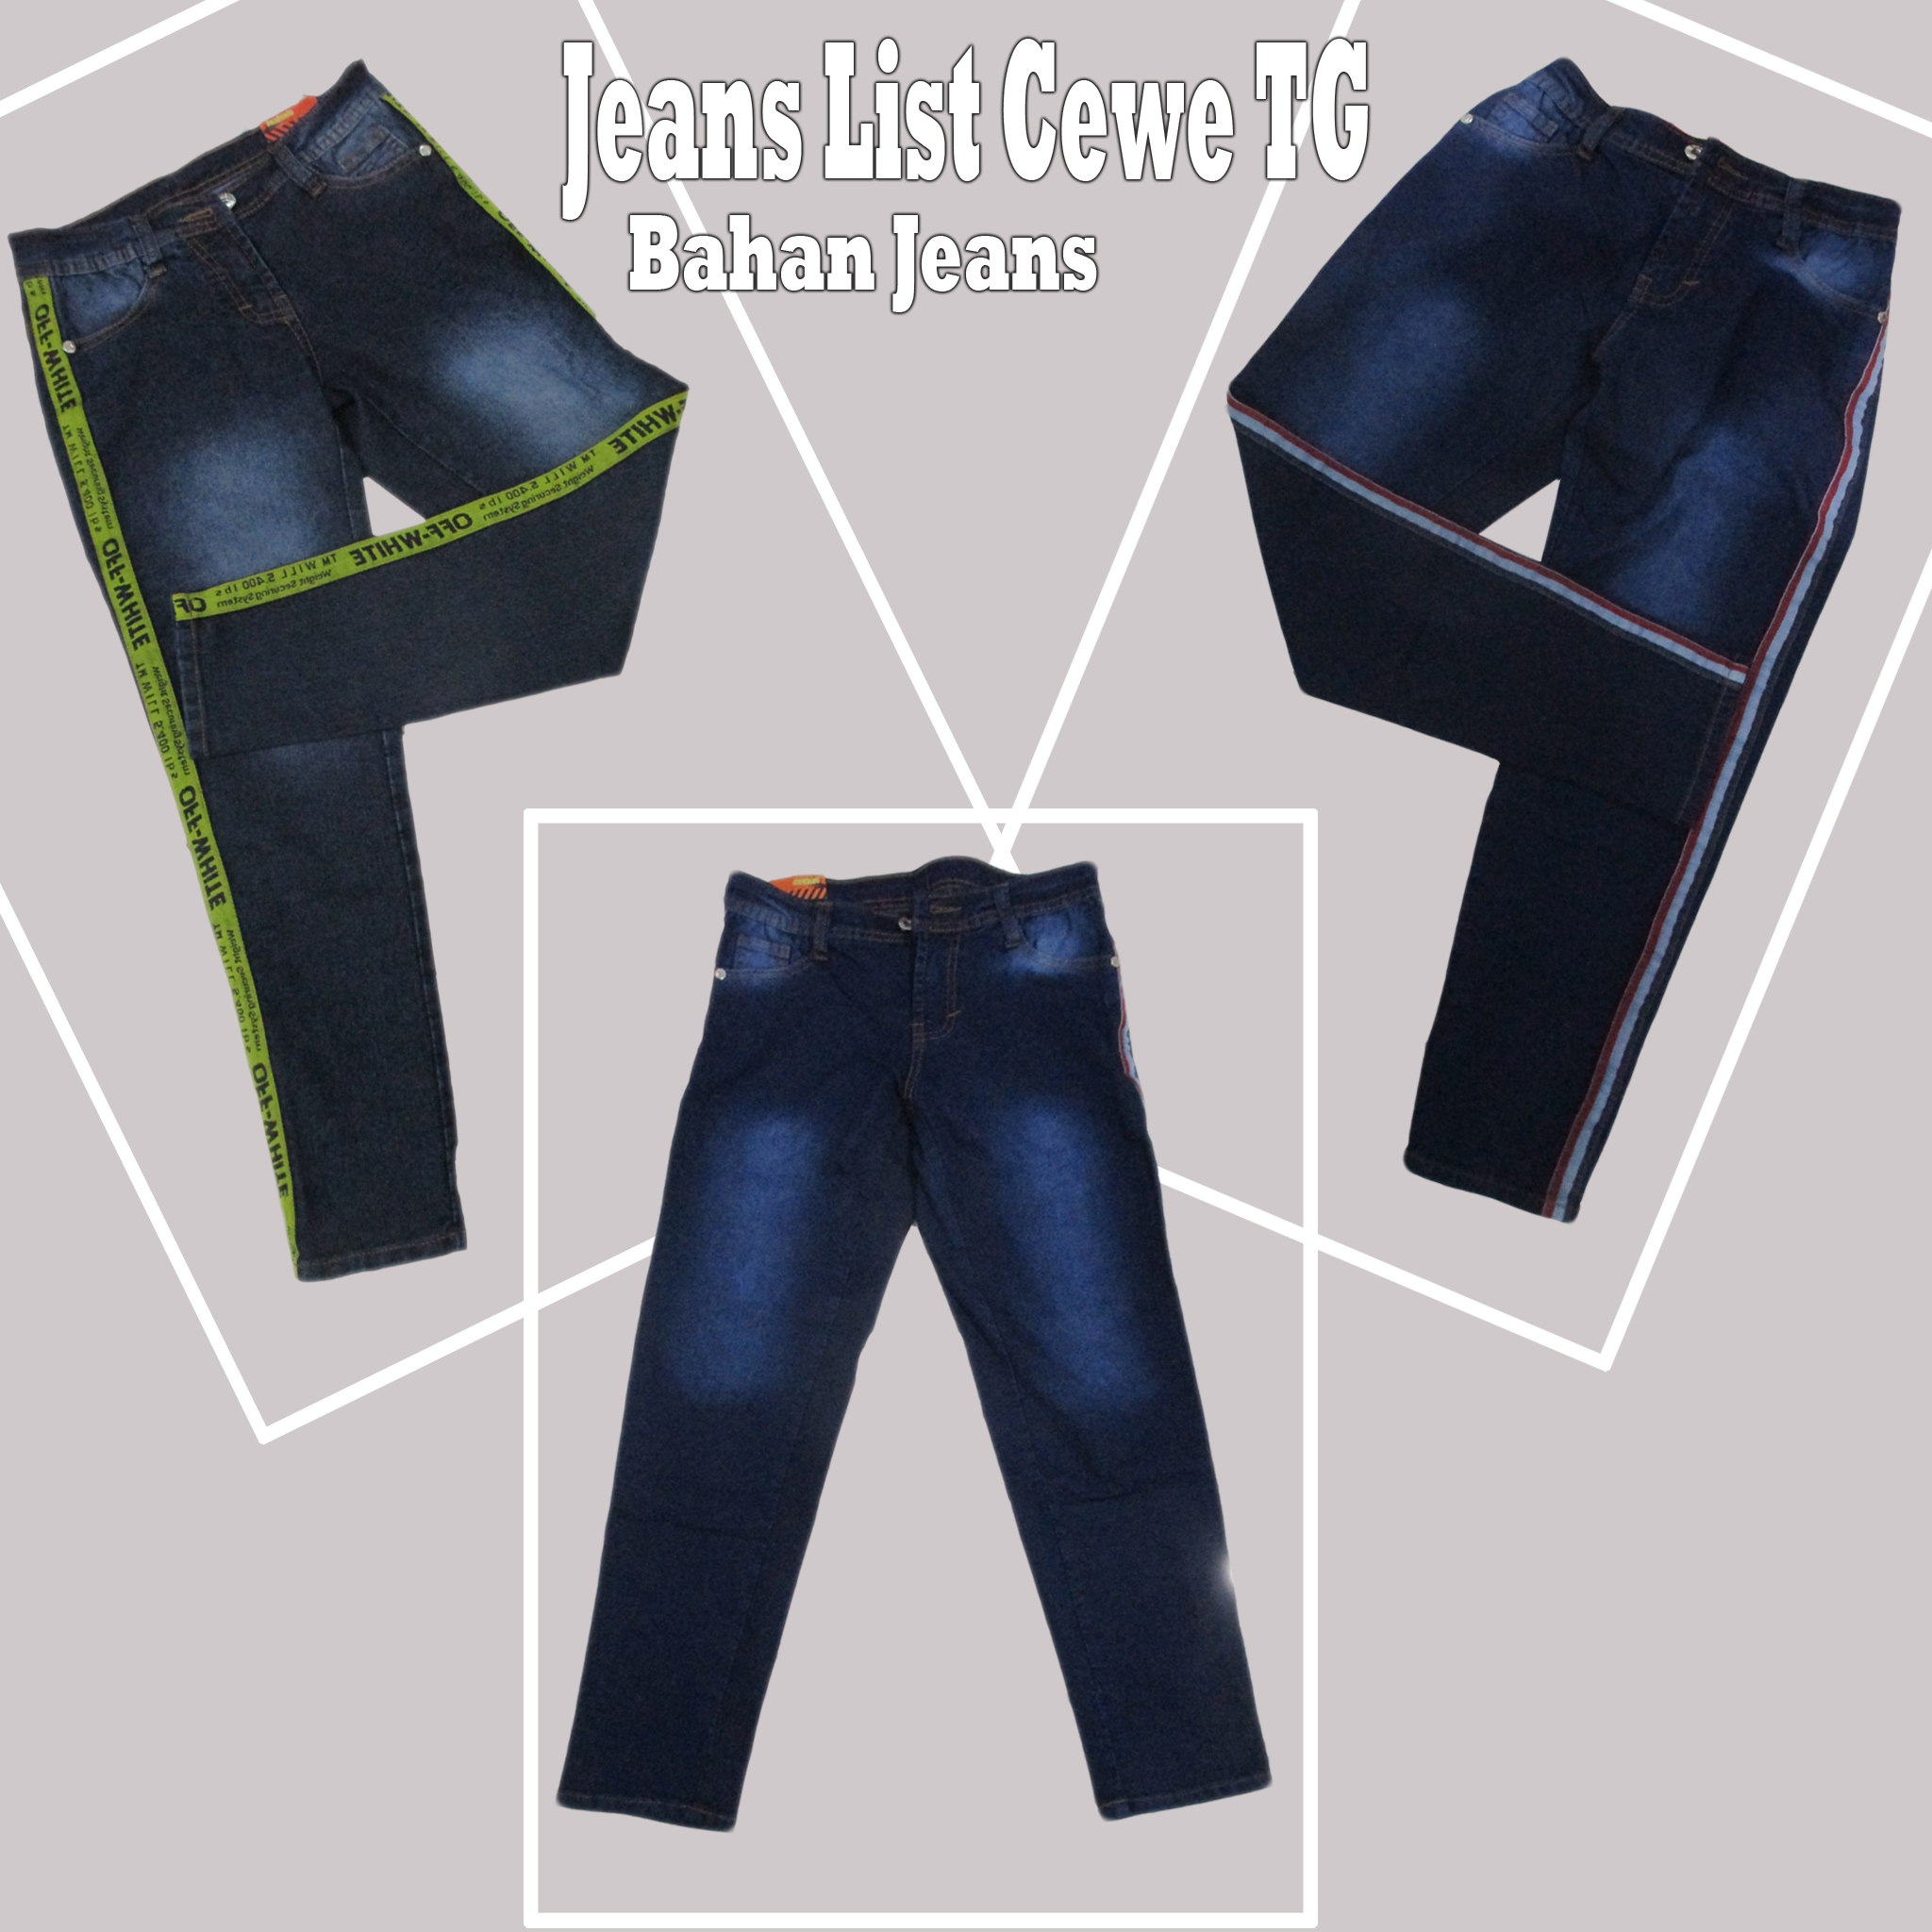 Pusat Grosir Baju Murah Solo Klewer 2019 Sentra Grosir Celana Jeans List Anak Murah 52ribuan